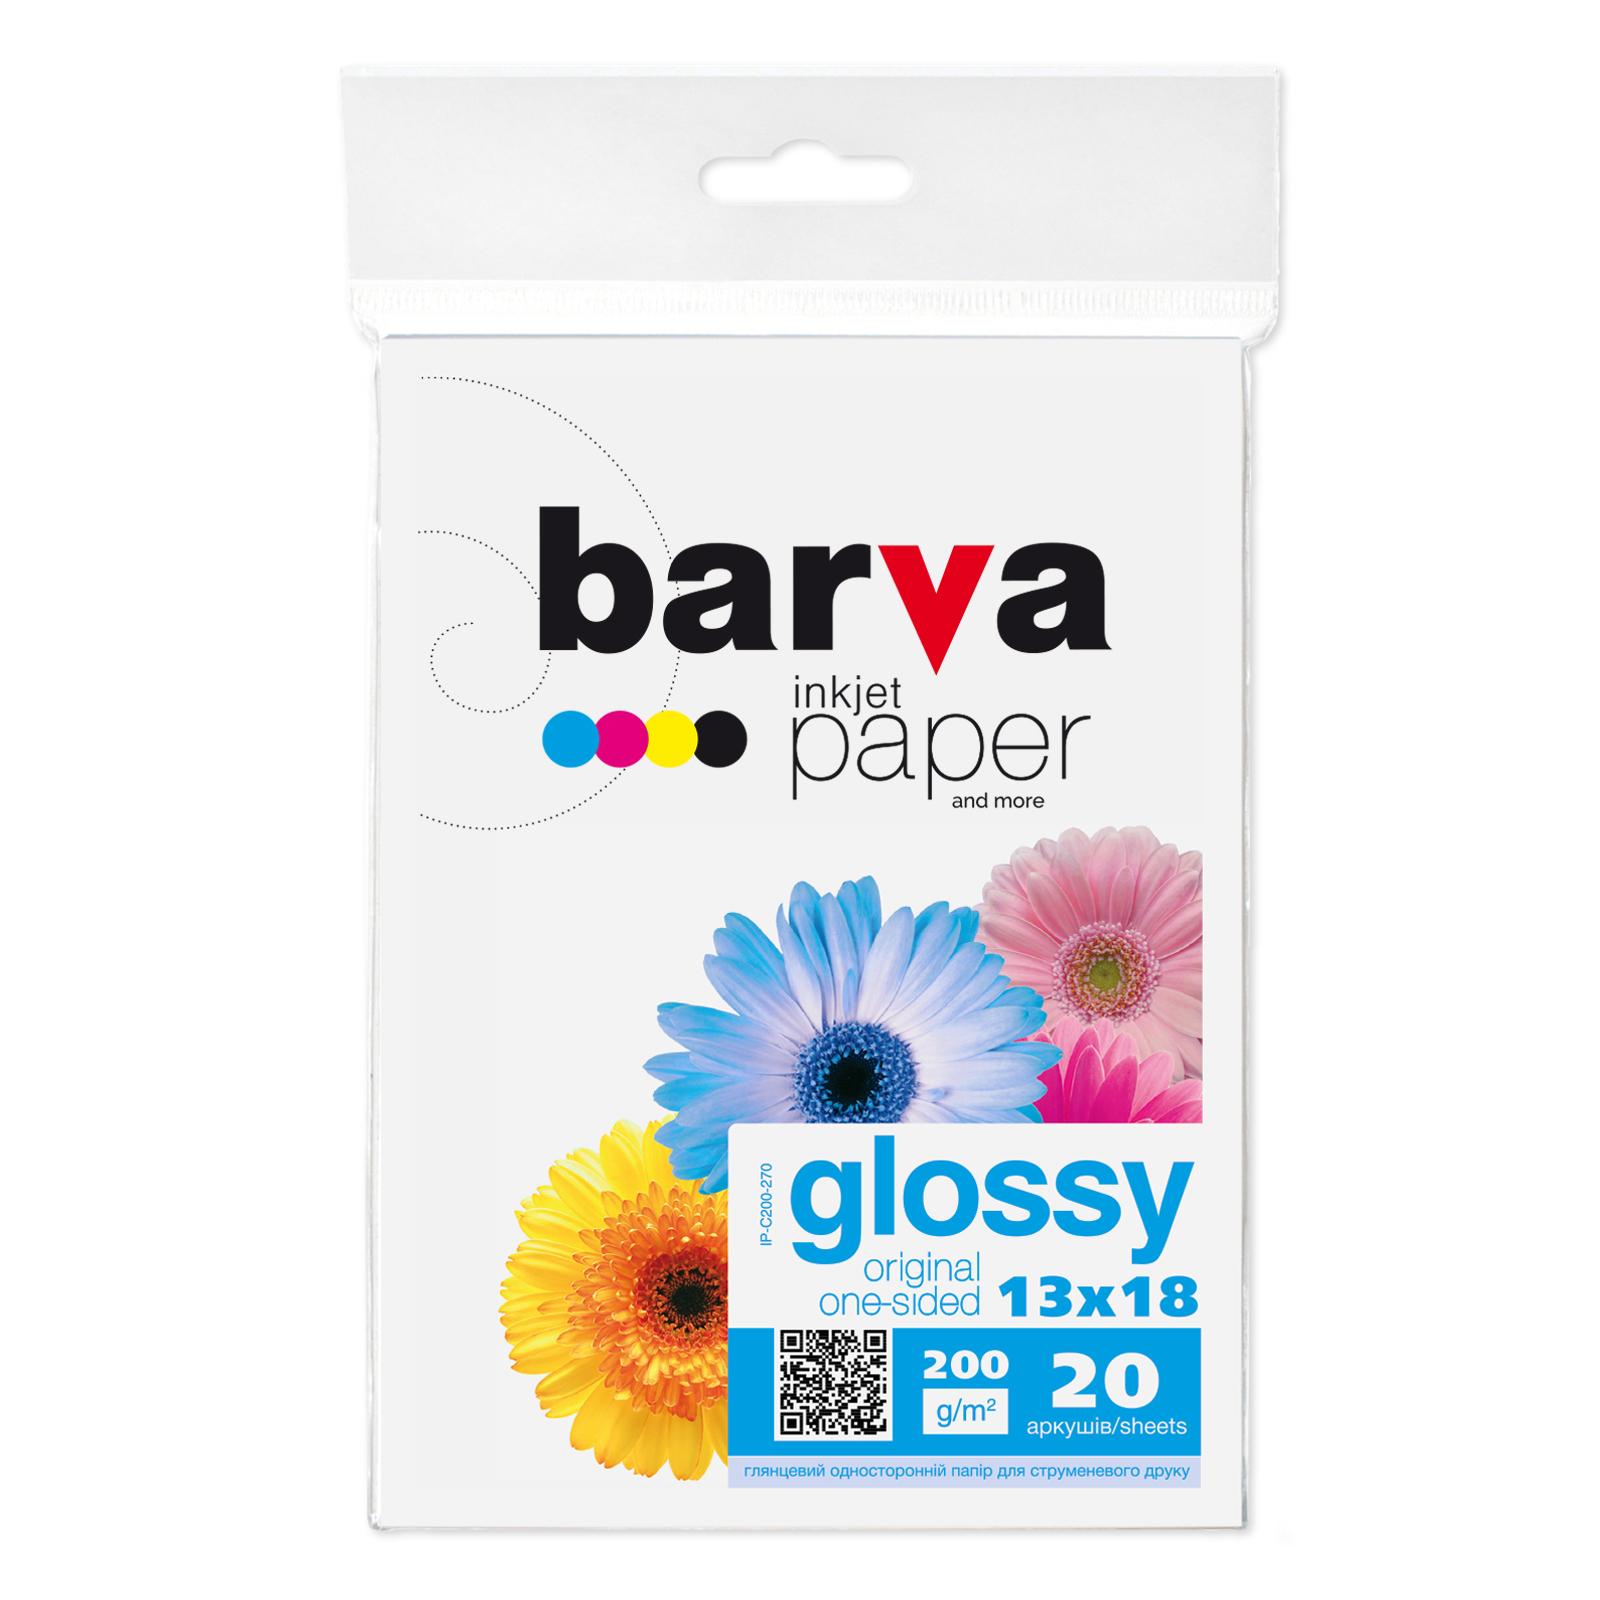 Бумага Barva 13x18, 200g/m2, Original Glossy, 20л (IP-C200-270)